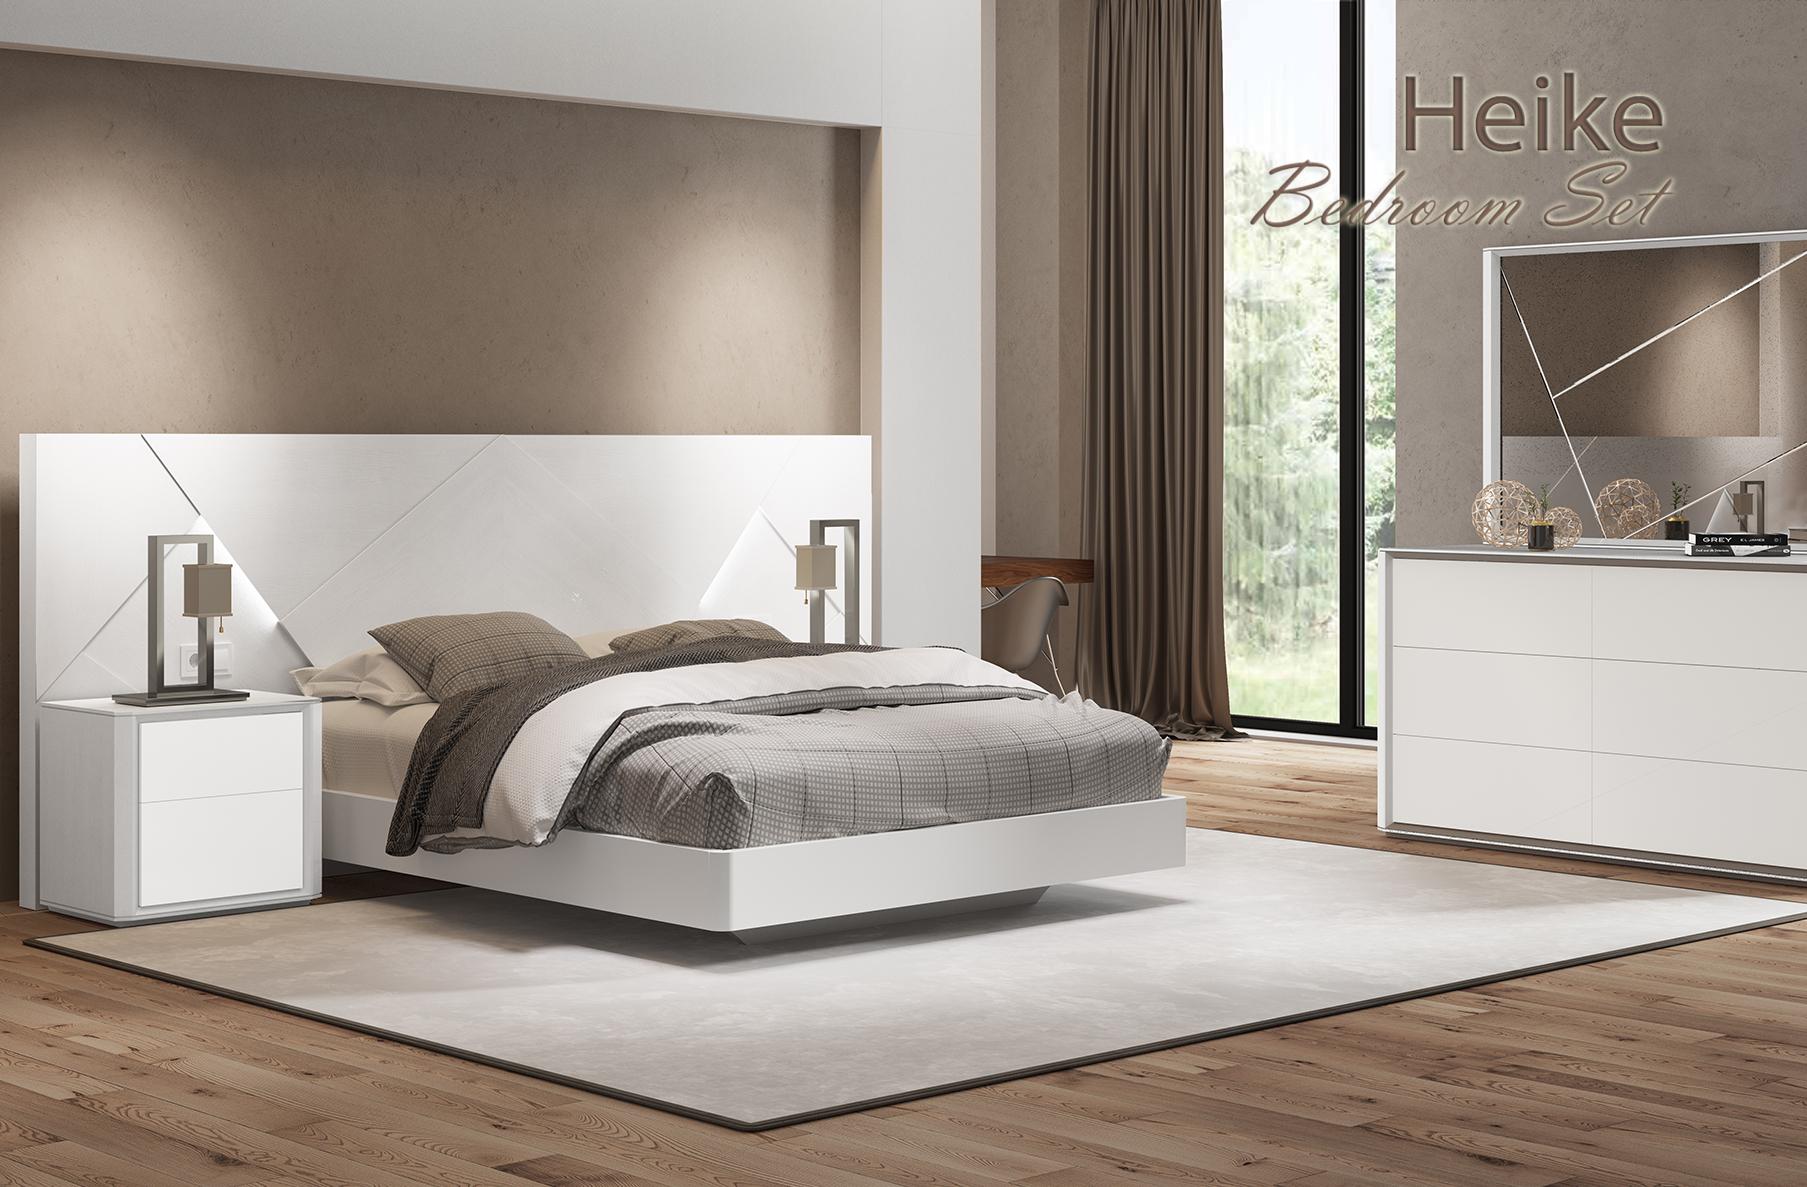 Heike Bedroom, Cheap